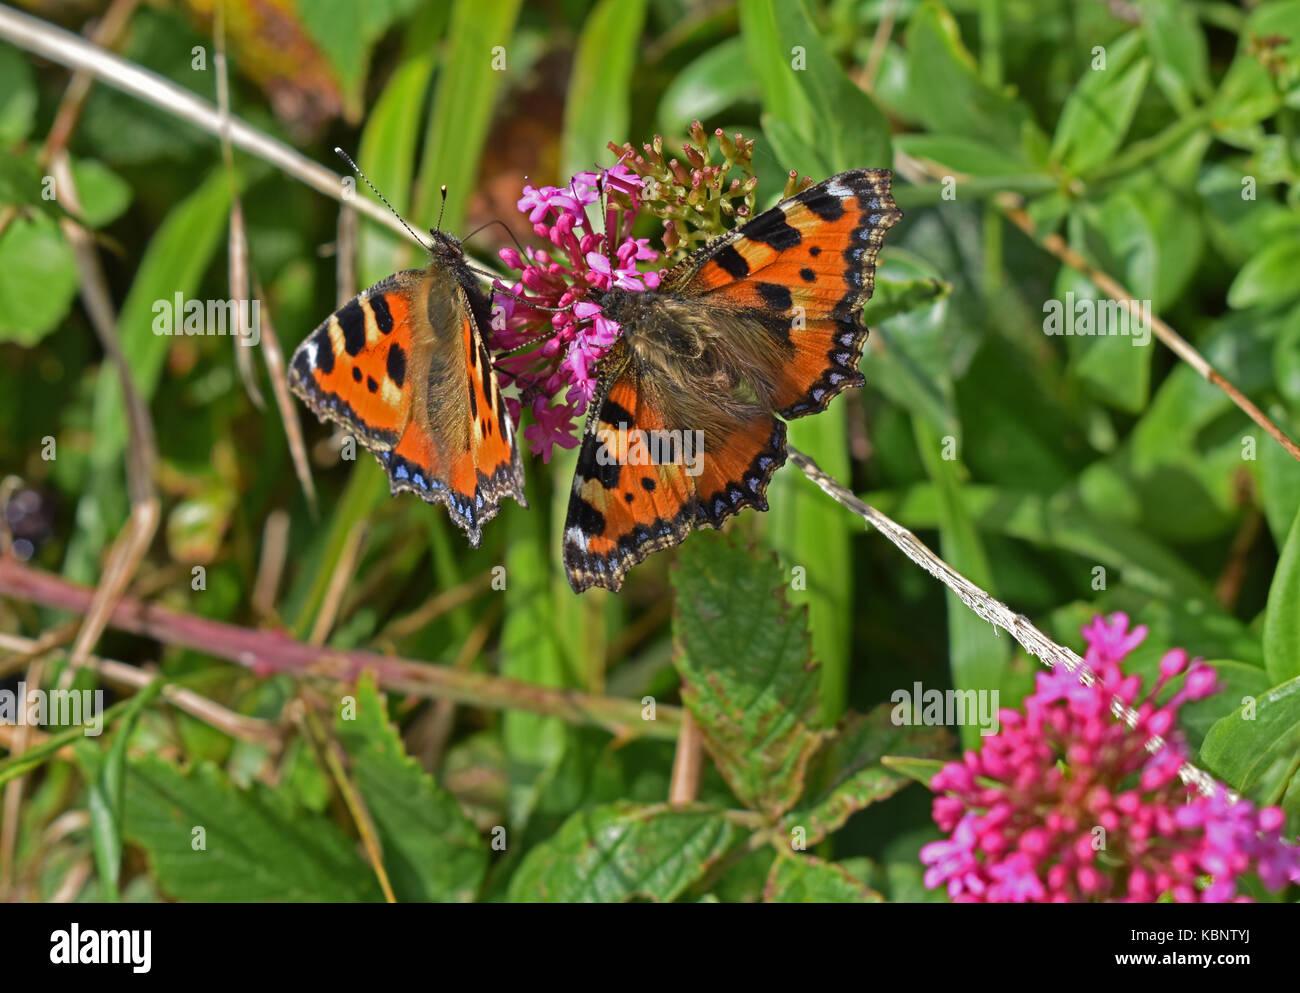 Small Tortoiseshell butterflies - Stock Image